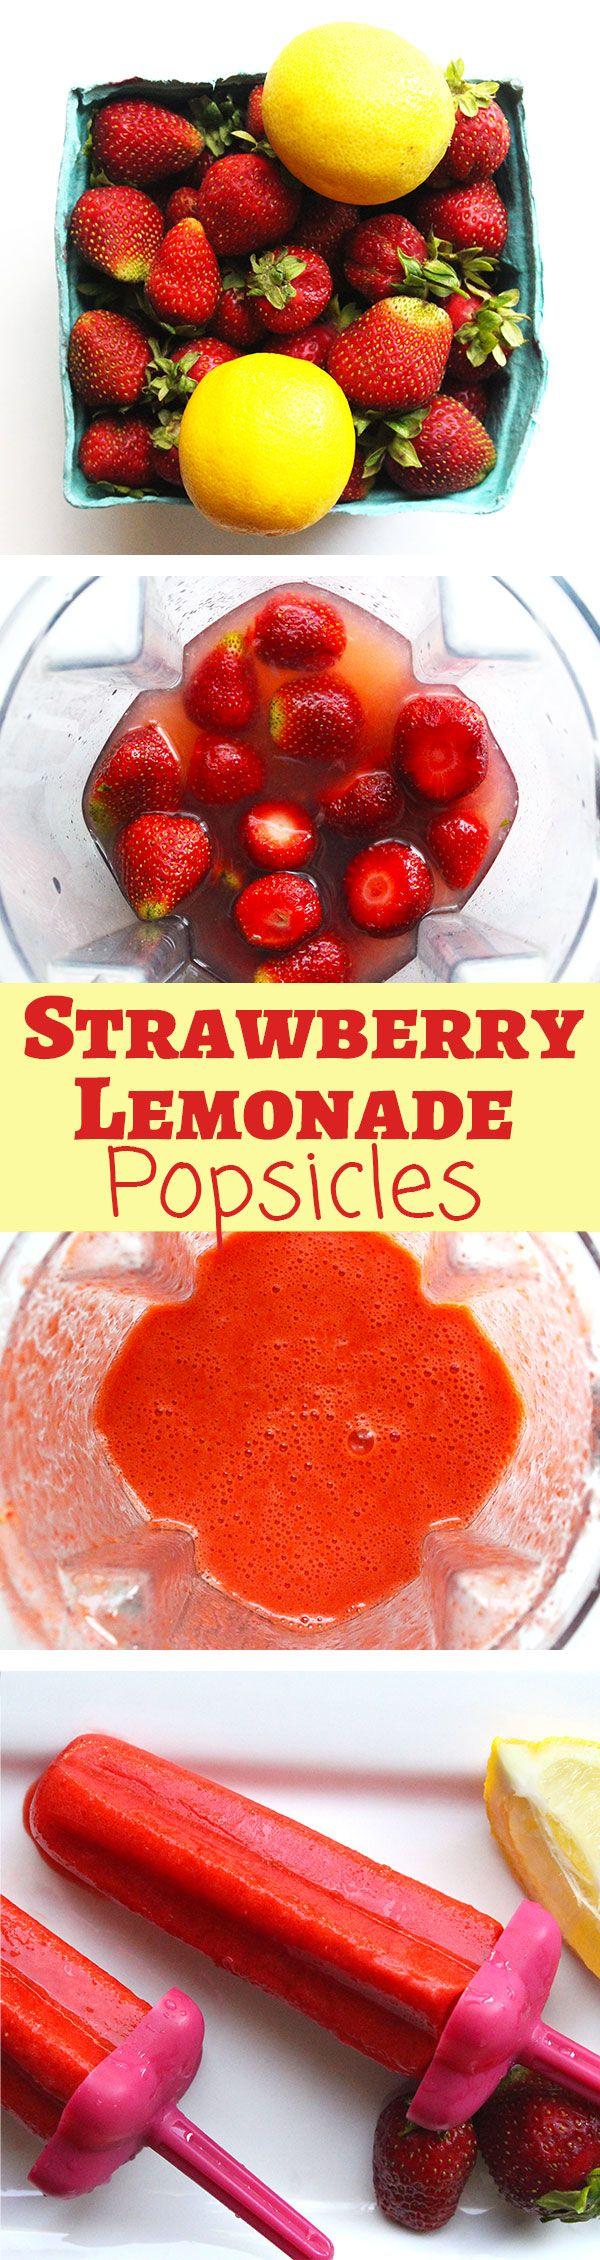 Homemade Strawberry Lemonade Popsicles | Real Fruit & No Added Sugar